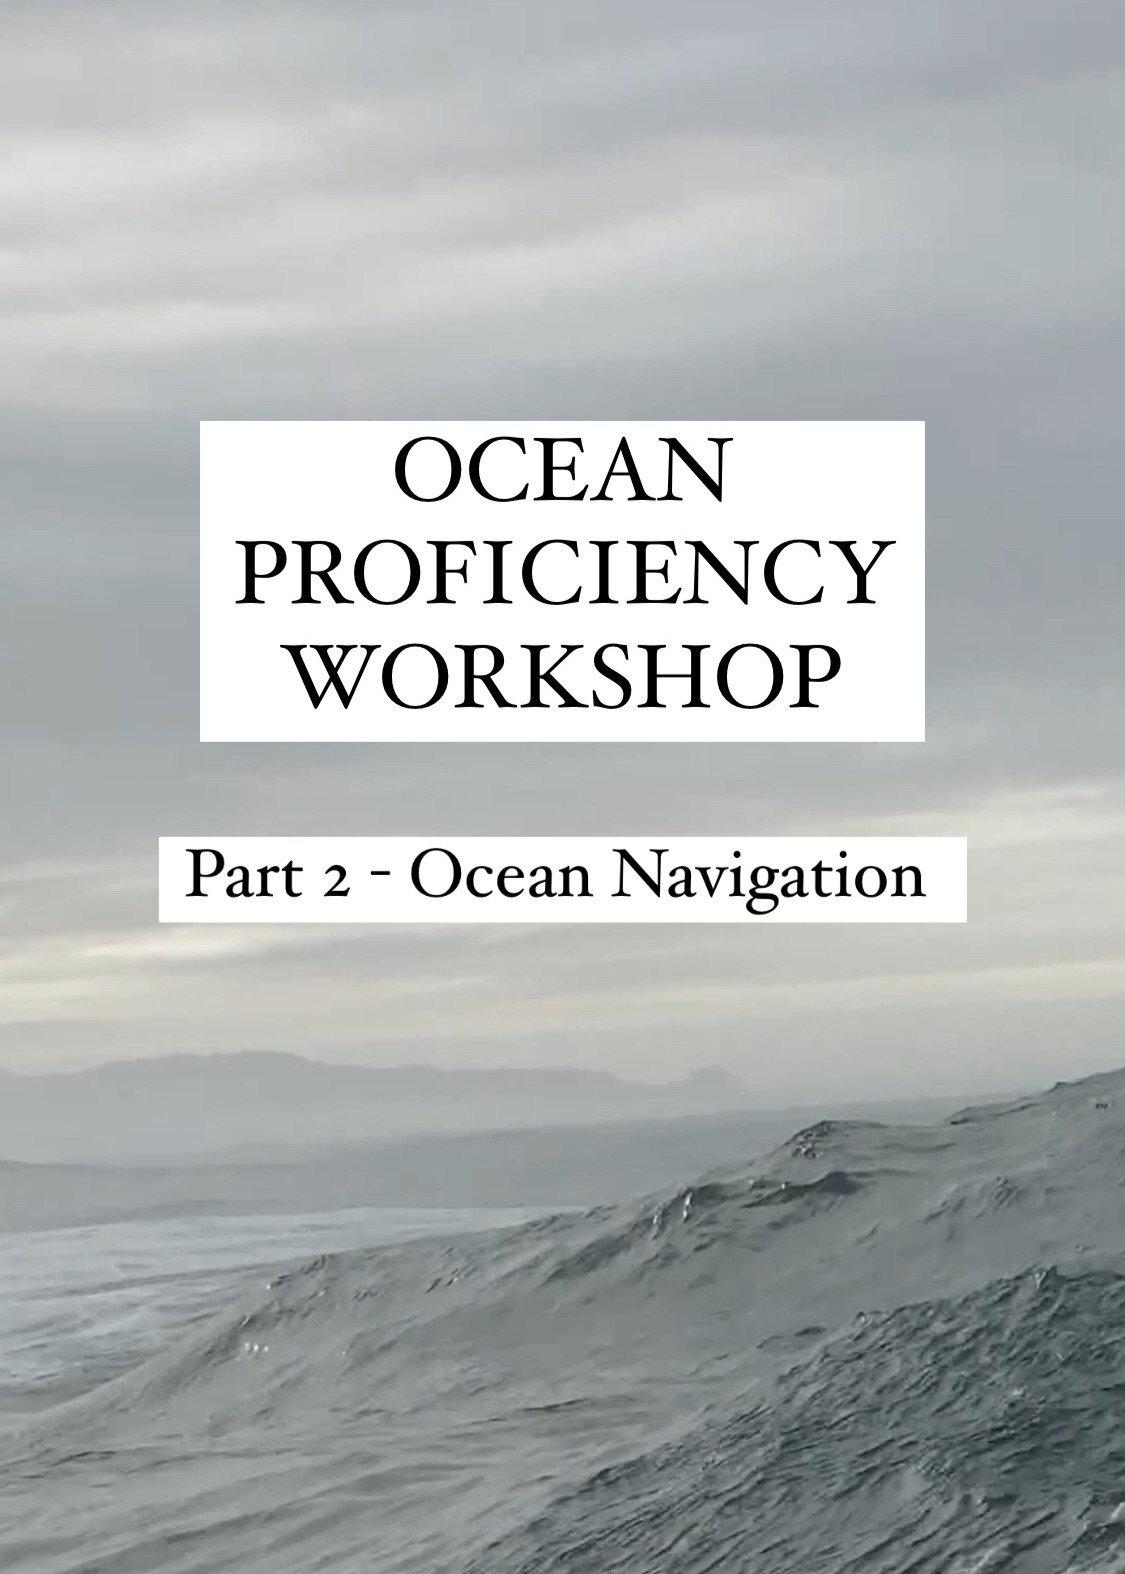 North Coast Ocean Proficiency Workshop 2